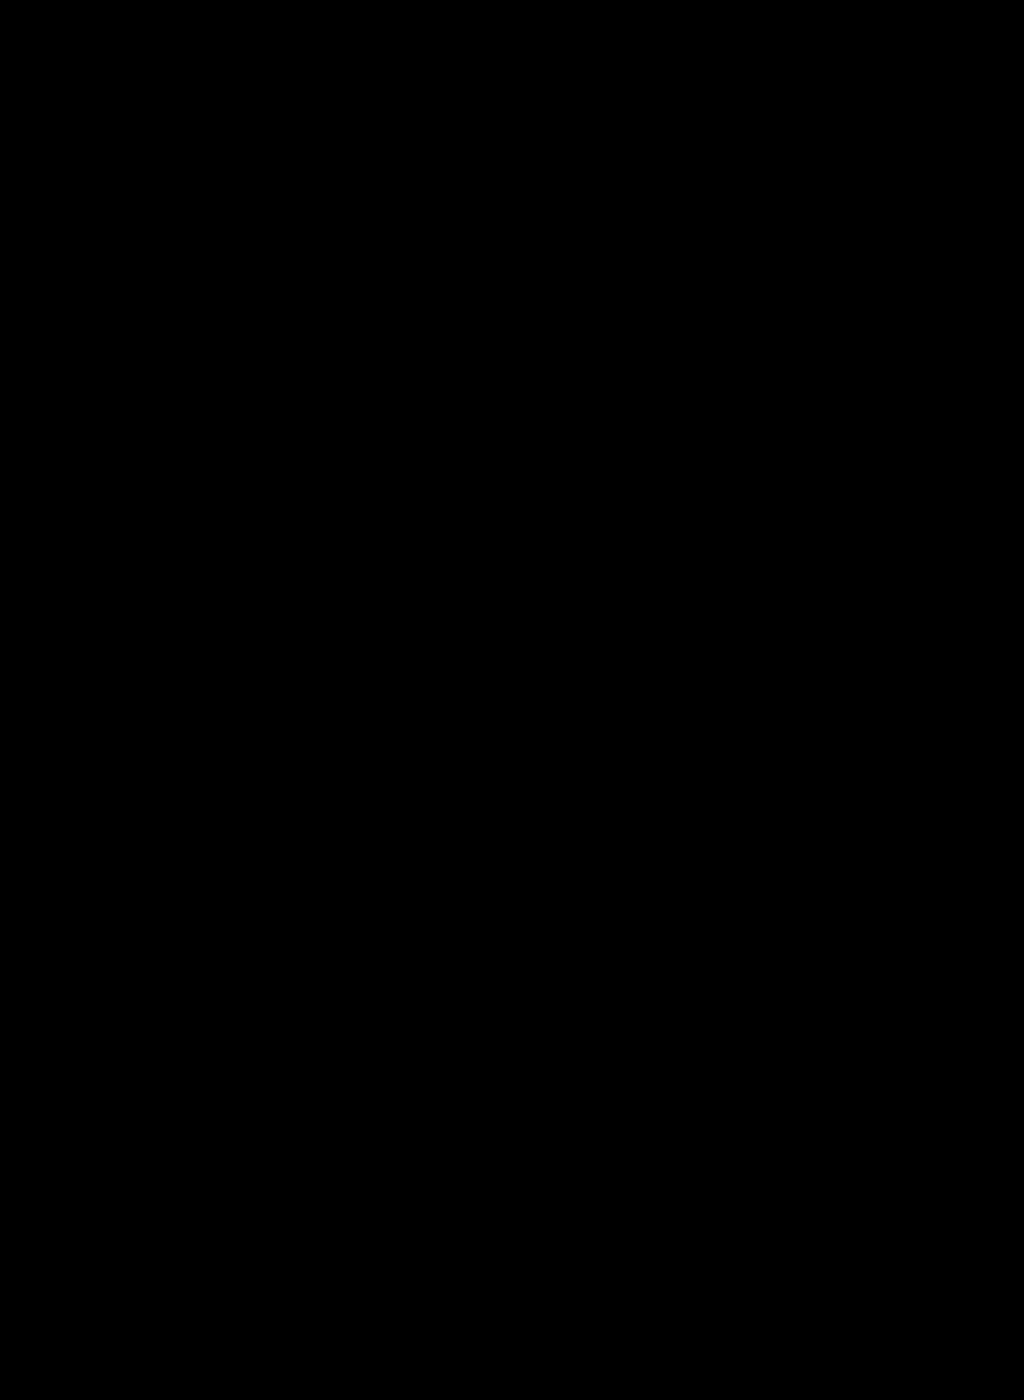 trans-800x600.png